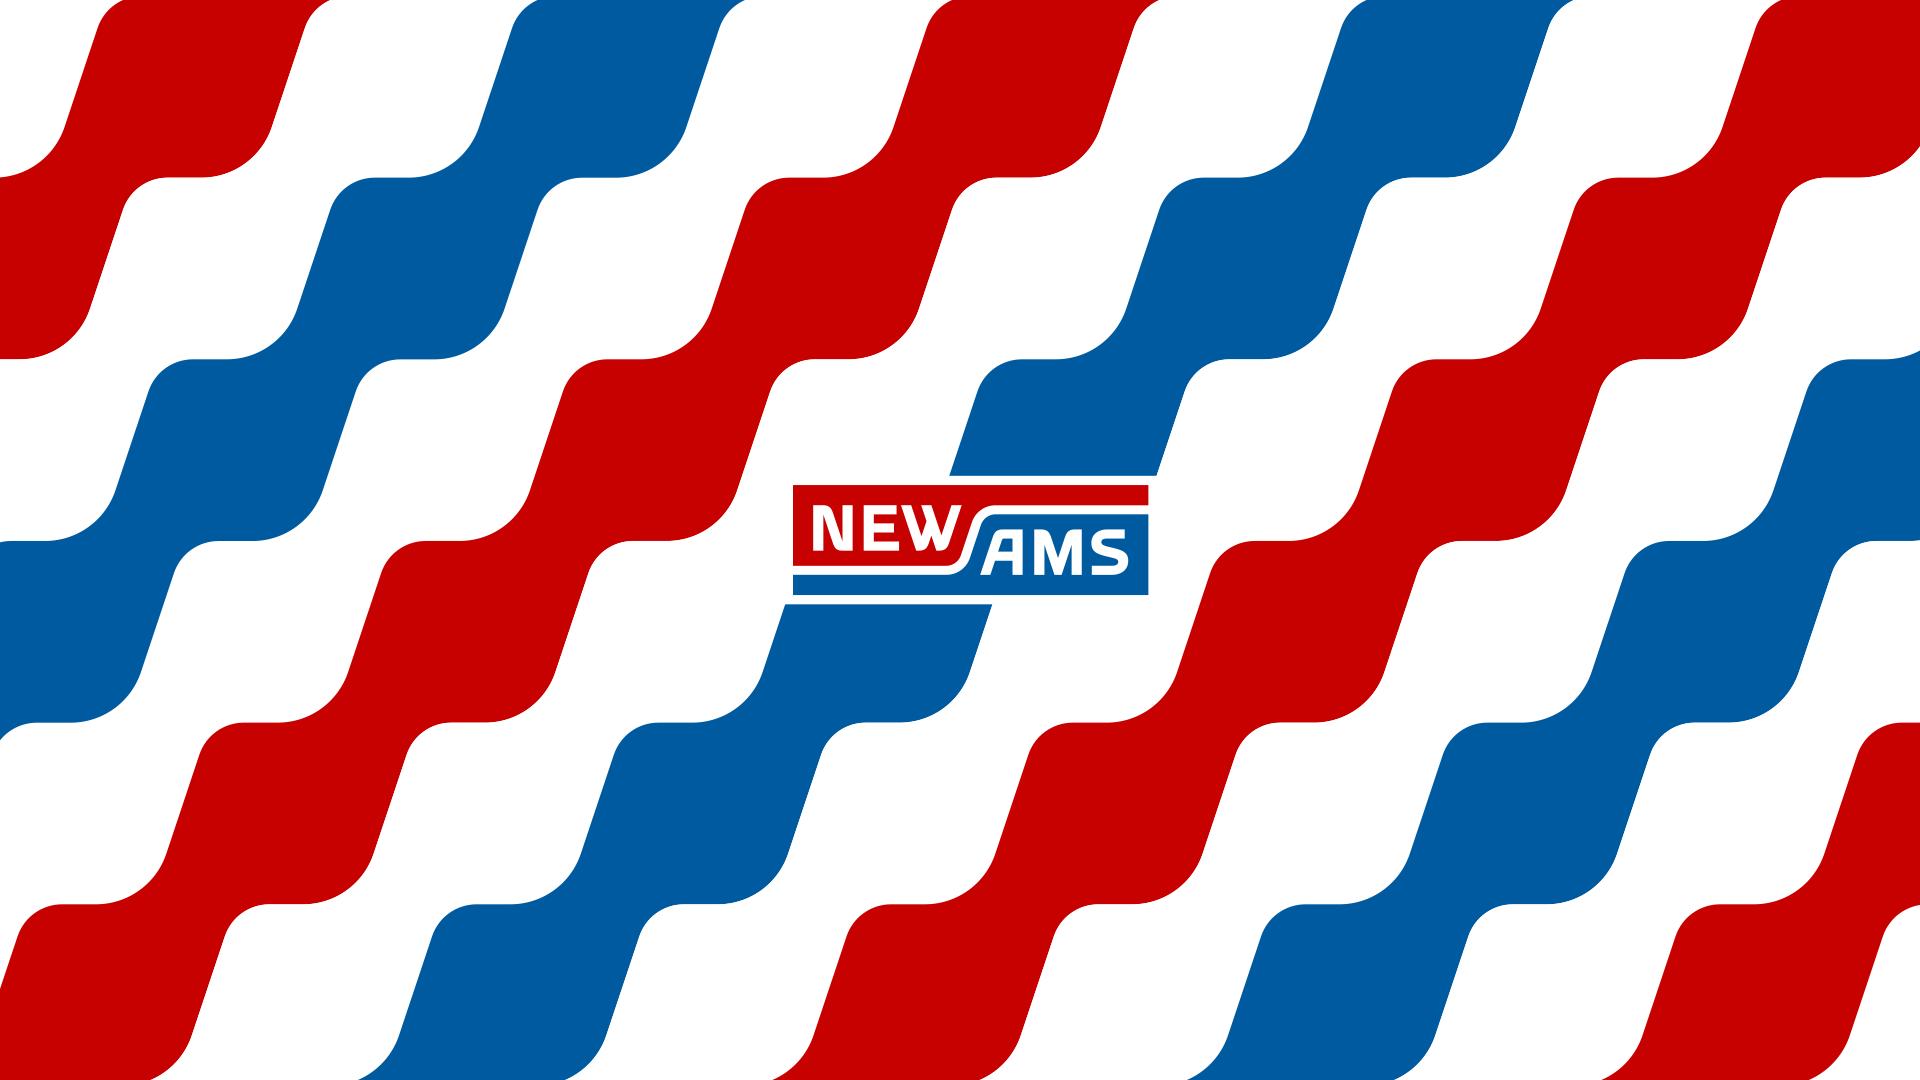 New Amsterdam Film Company